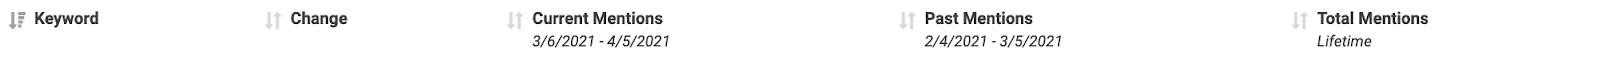 screenshot of GatherUp sentiment report filters